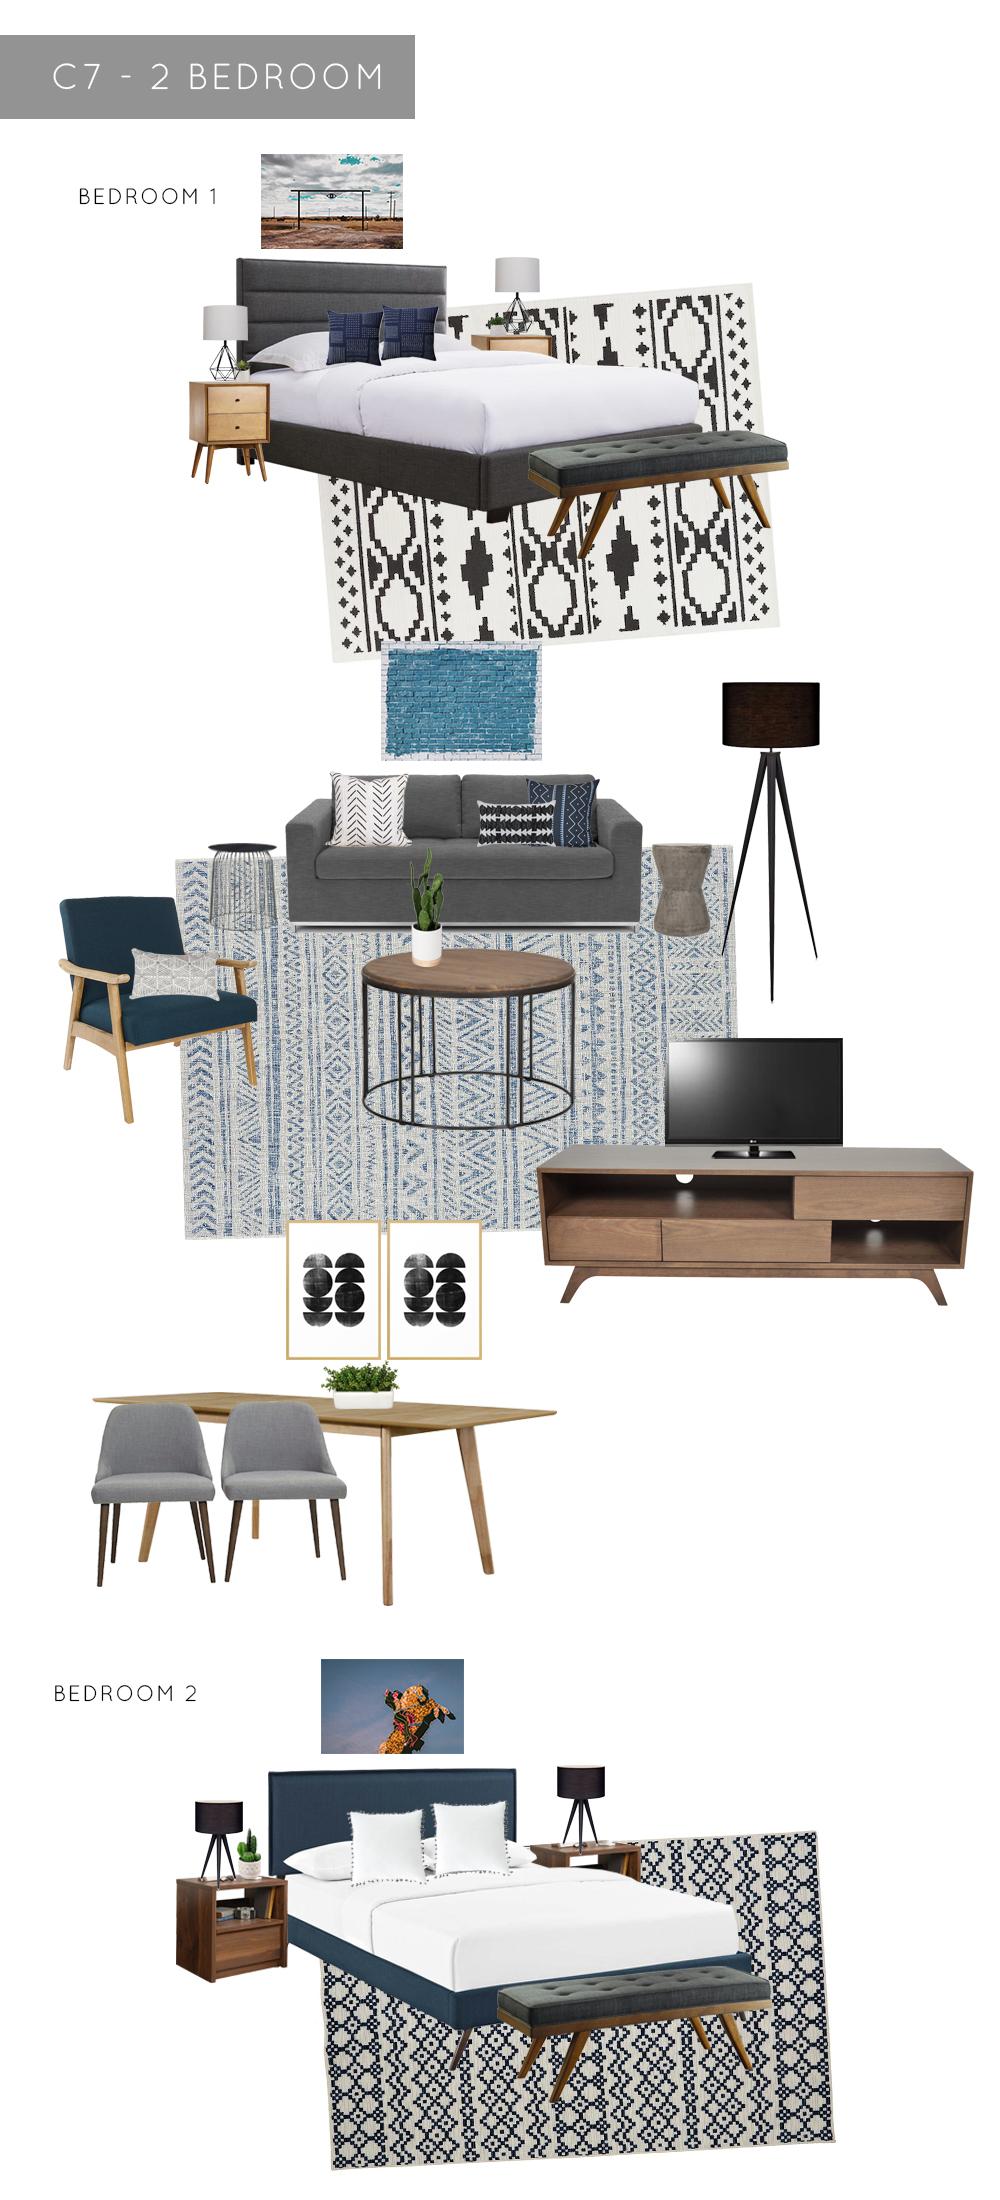 Behind-the-scenes-locale-apartment-hotel-2-bedroom-floorplan-Austin-Texas-Love-Ding.jpg